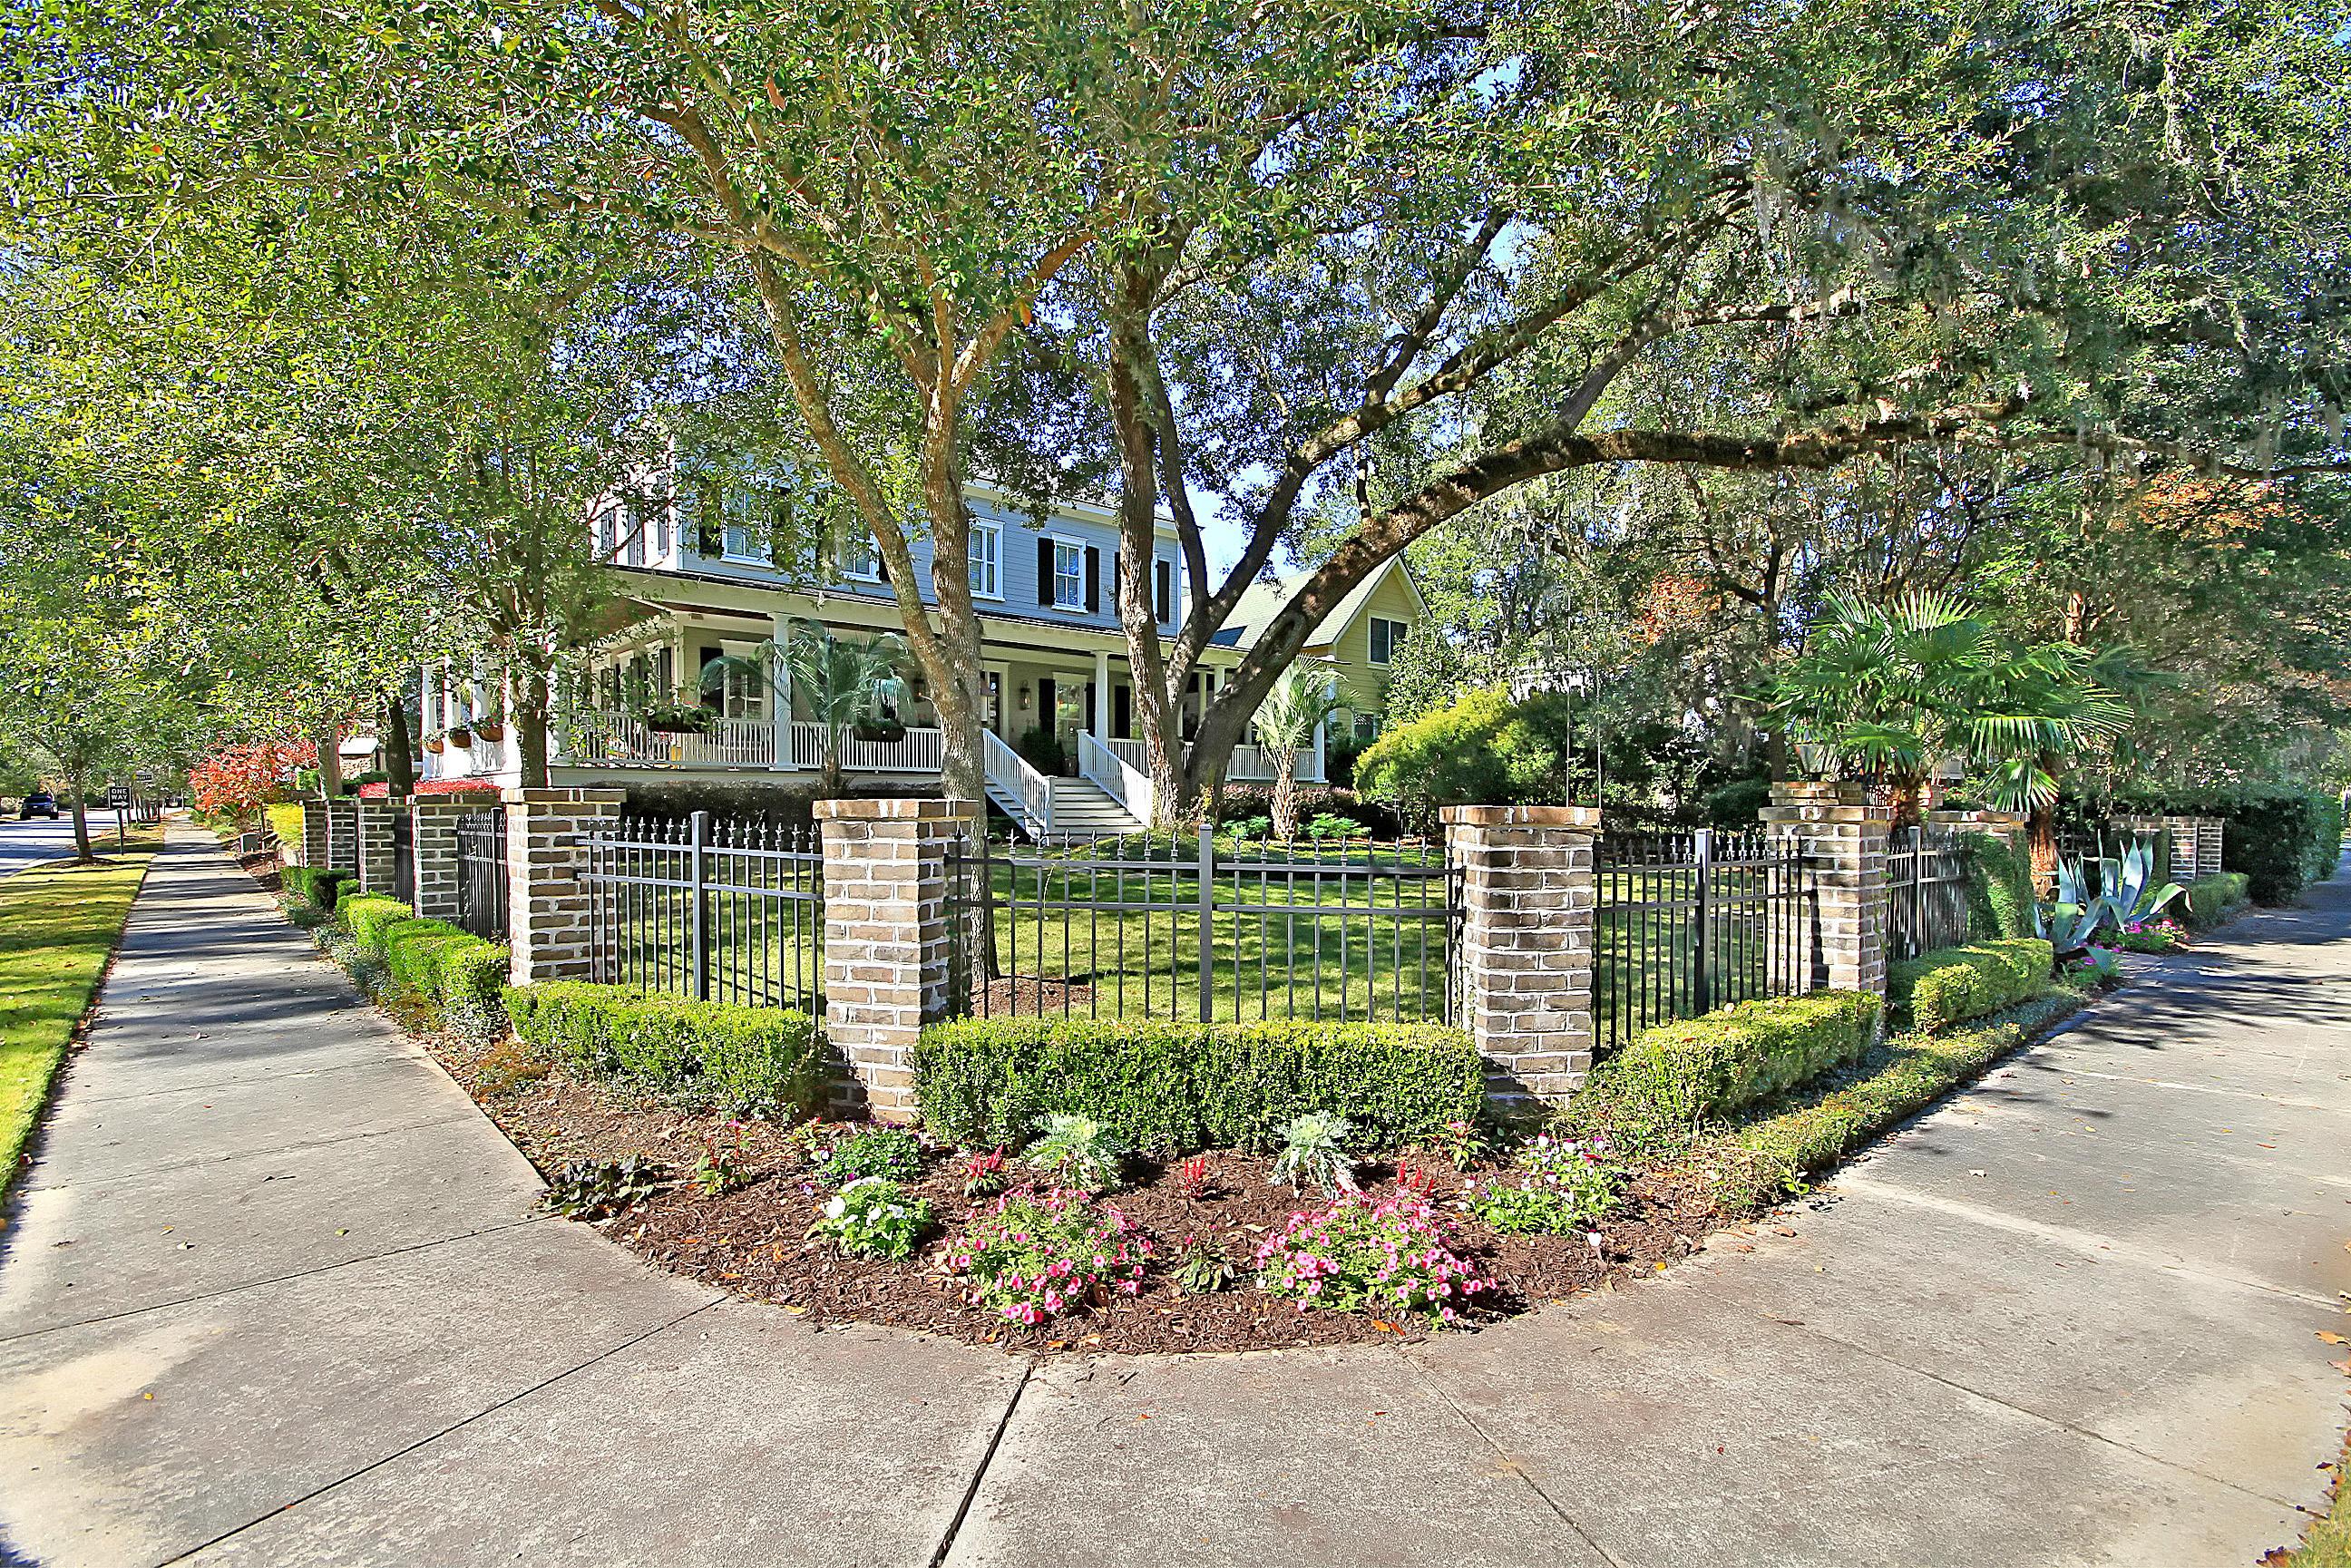 Daniel Island Park Homes For Sale - 231 Delahow, Daniel Island, SC - 8